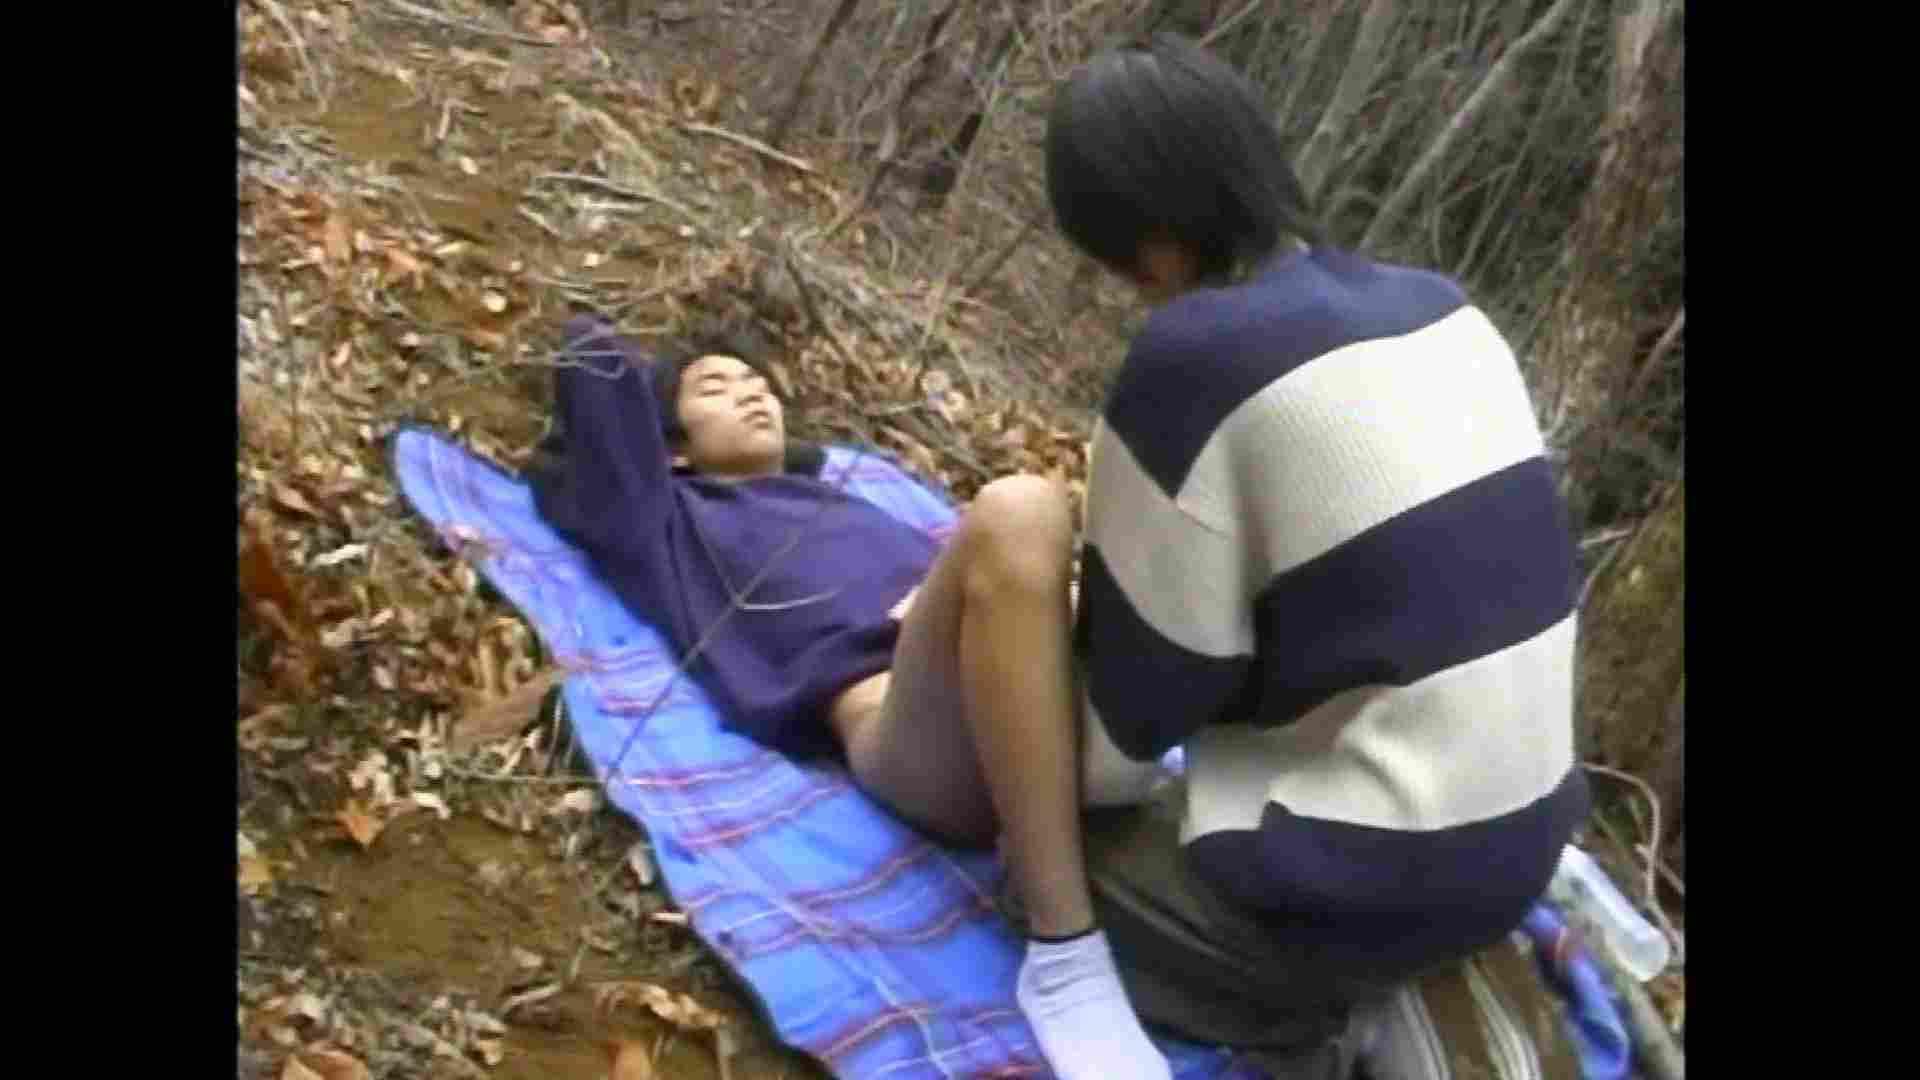 GAYBOY宏のオカズ倉庫Vol.5-3 ノンケ達のセックス ゲイ無修正動画画像 59画像 38